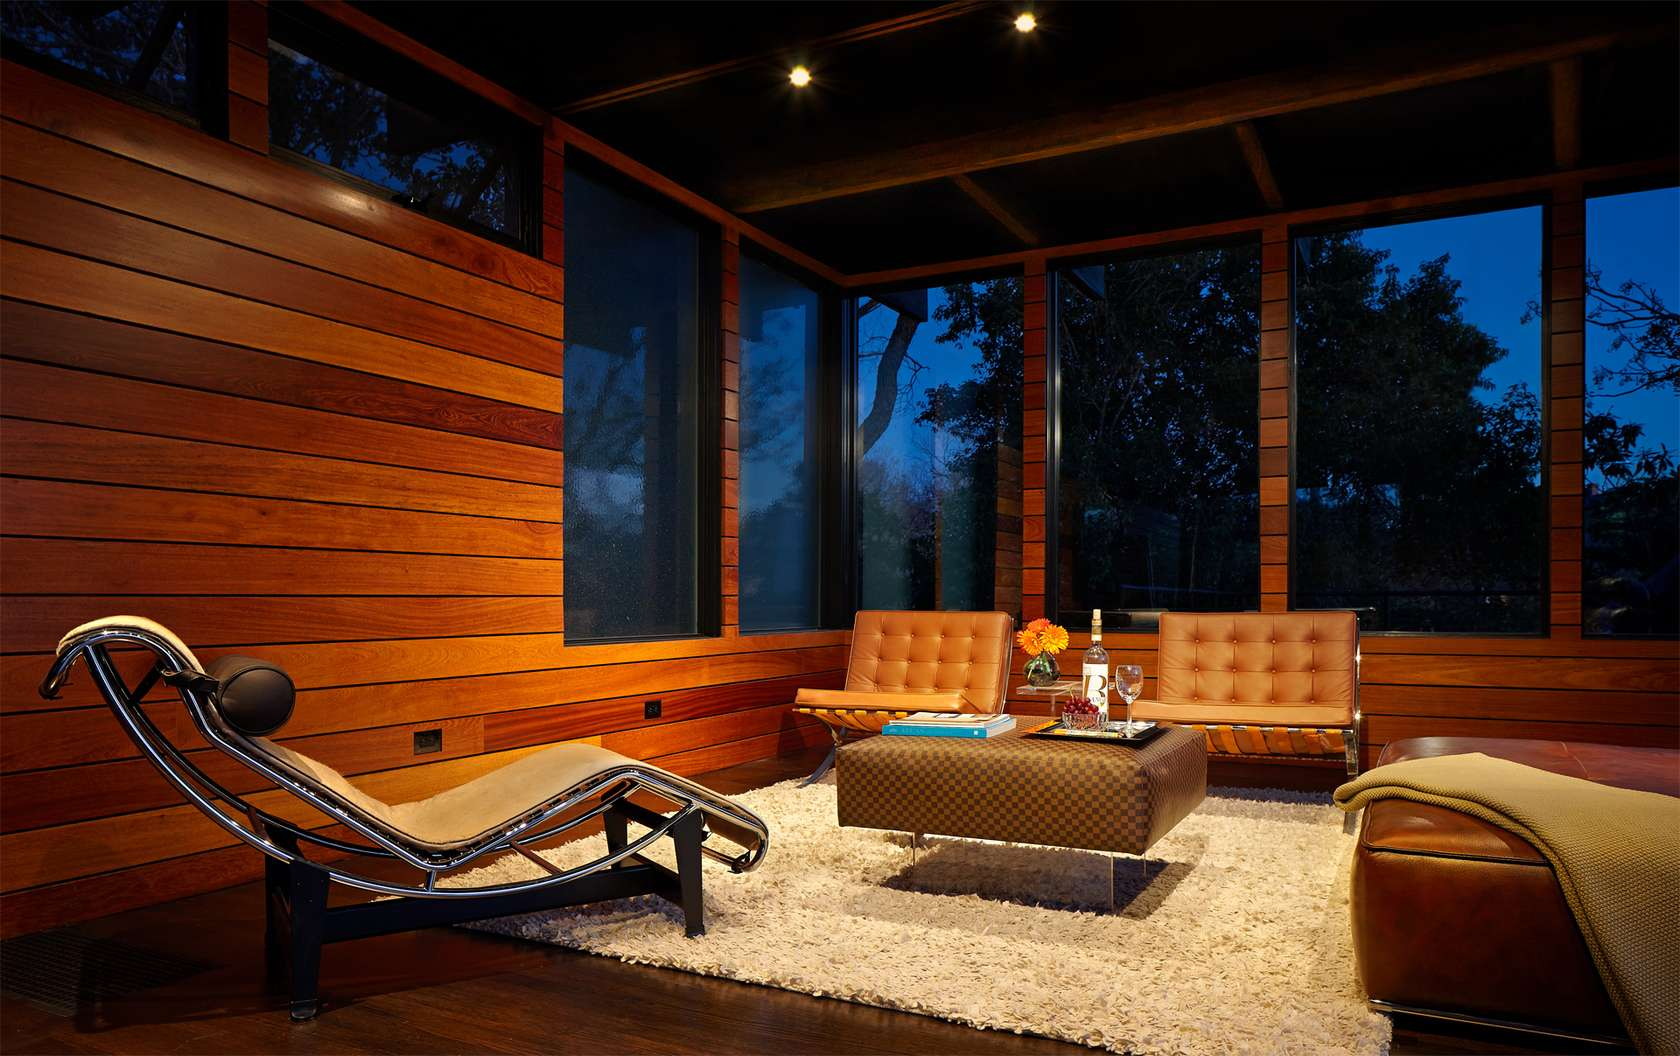 Orange Barcelona Chairs Interior Design Ideas